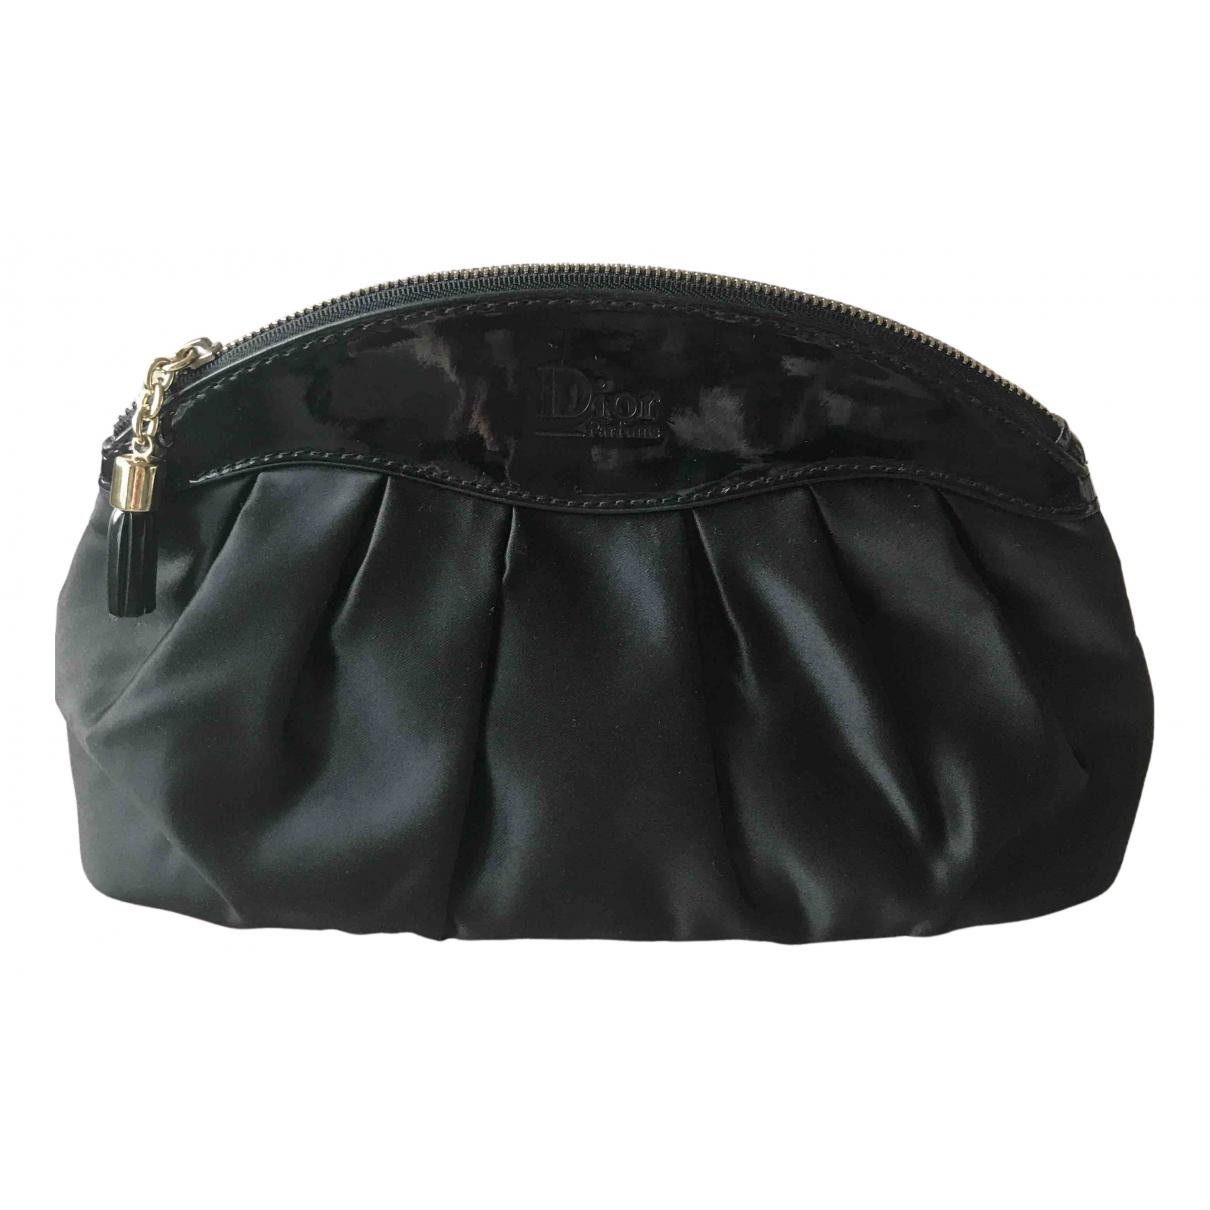 Dior N Black Travel bag for Women N